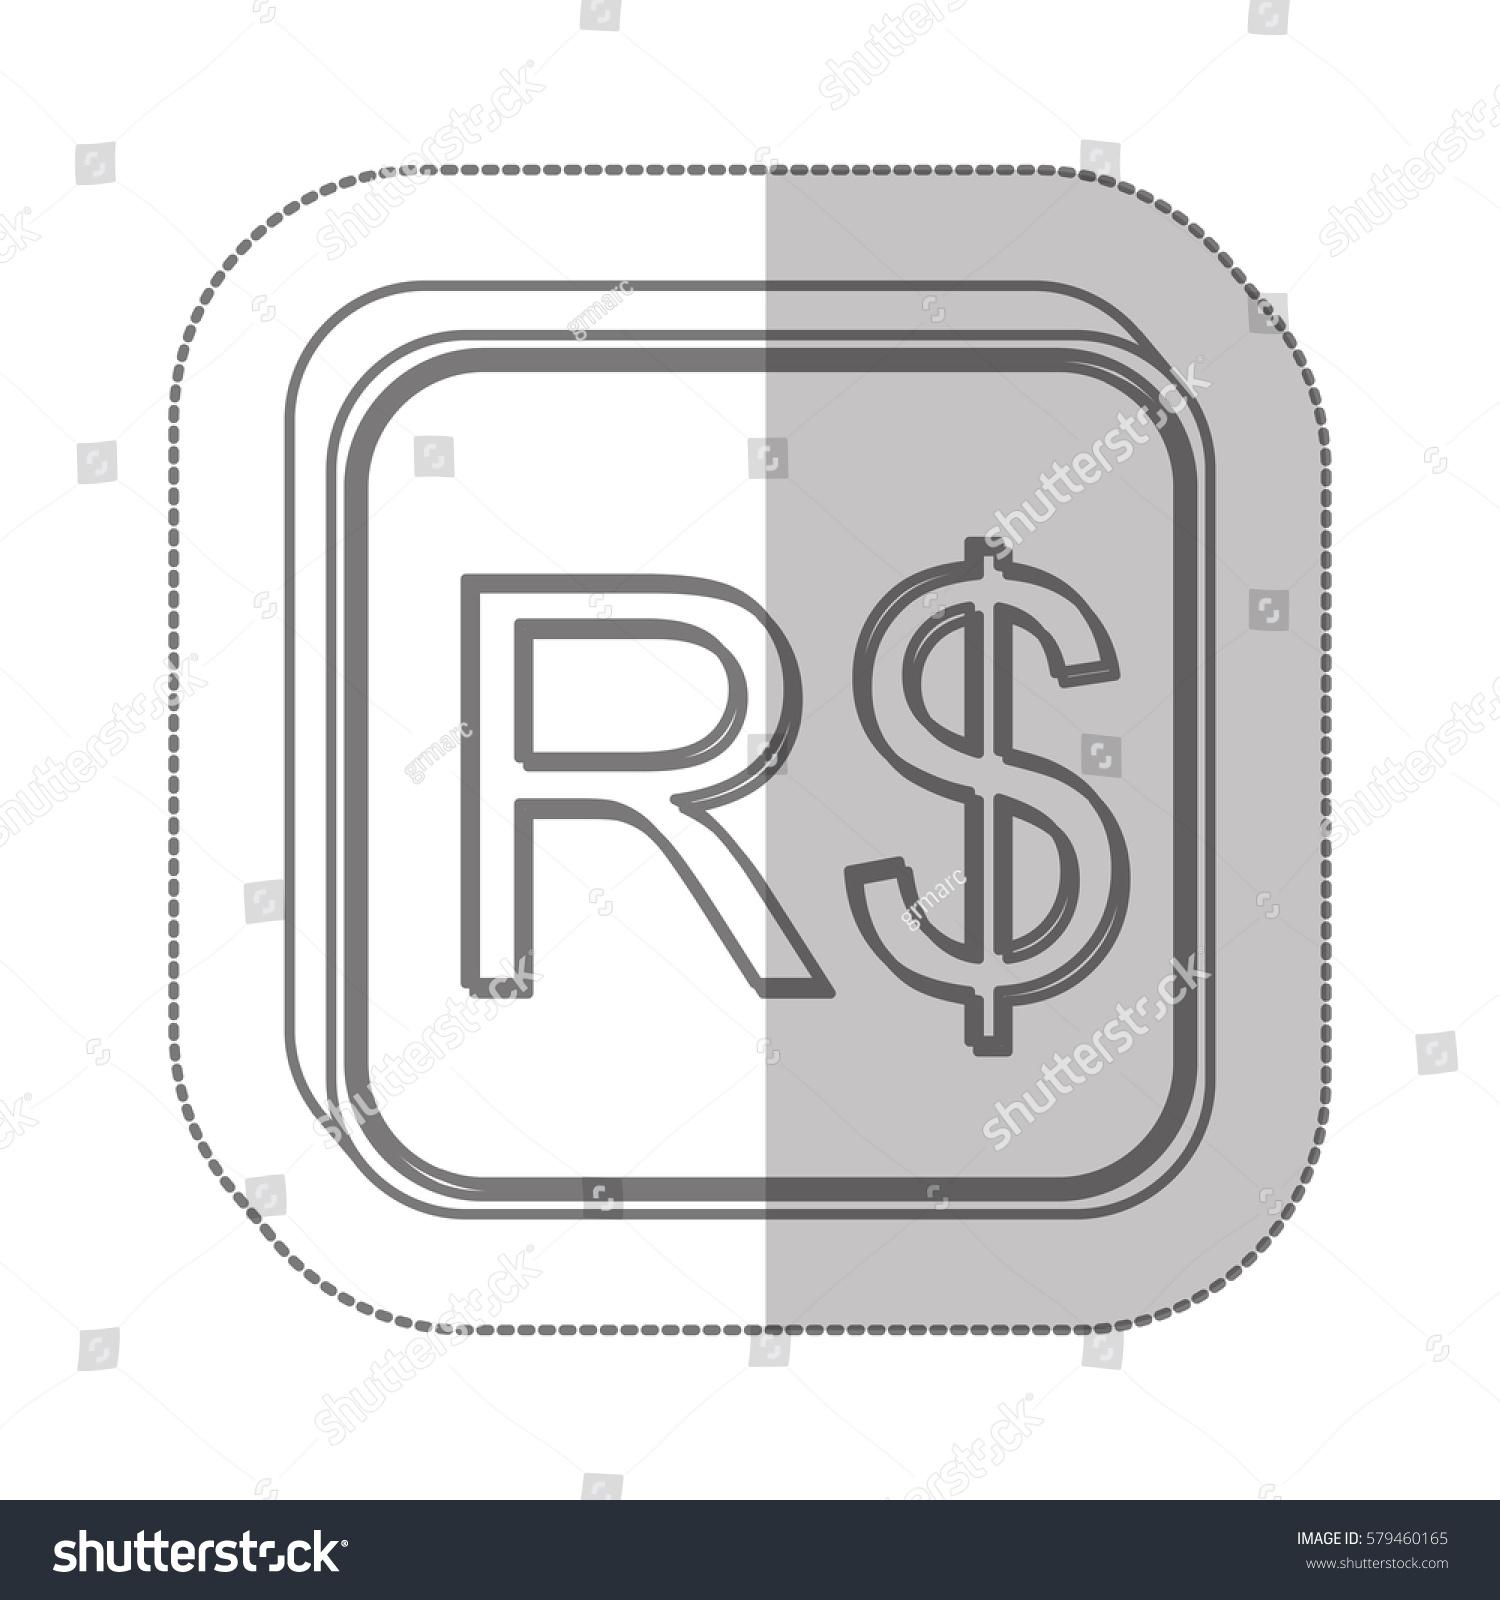 Real brazil currency symbol icon image stock vector 579460165 real brazil currency symbol icon image vector illustration buycottarizona Images